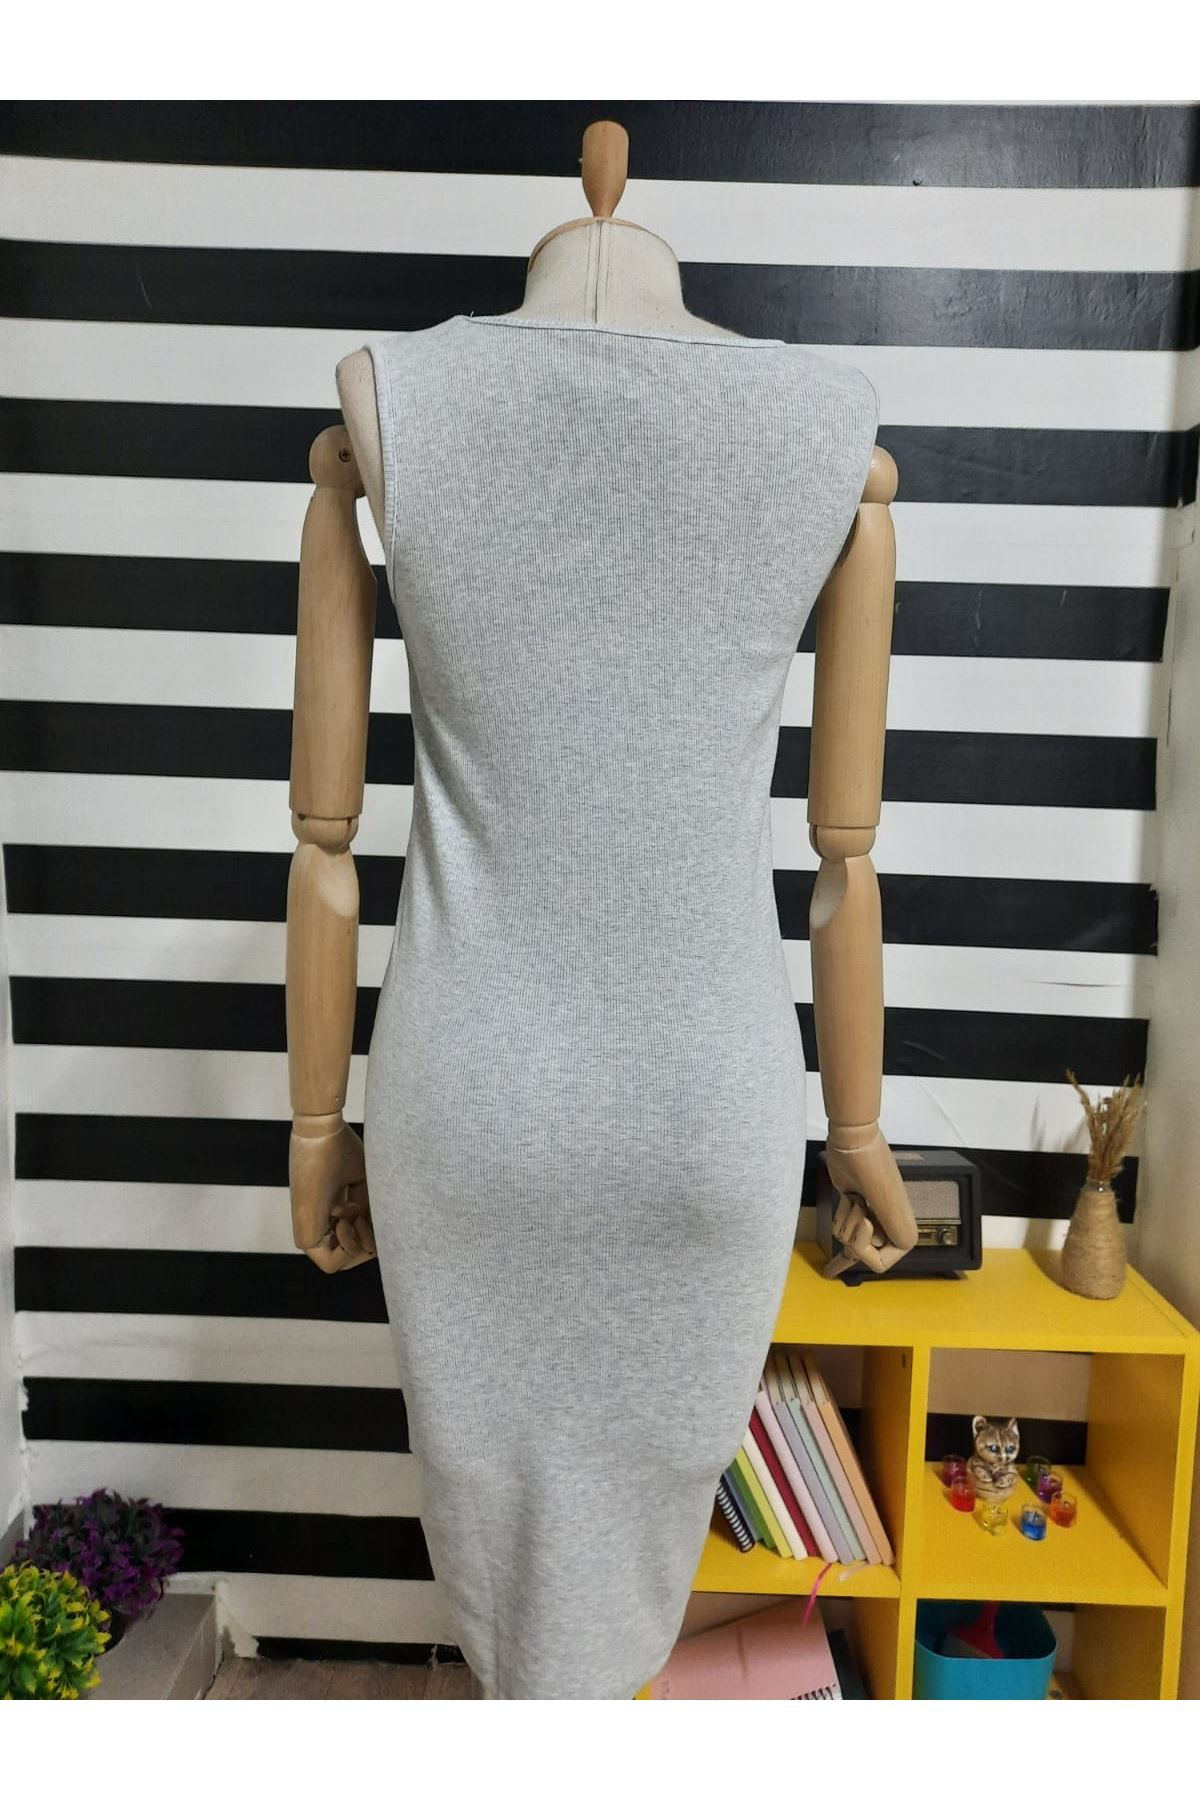 LV Model Kaşkorse Elbise - GRİ